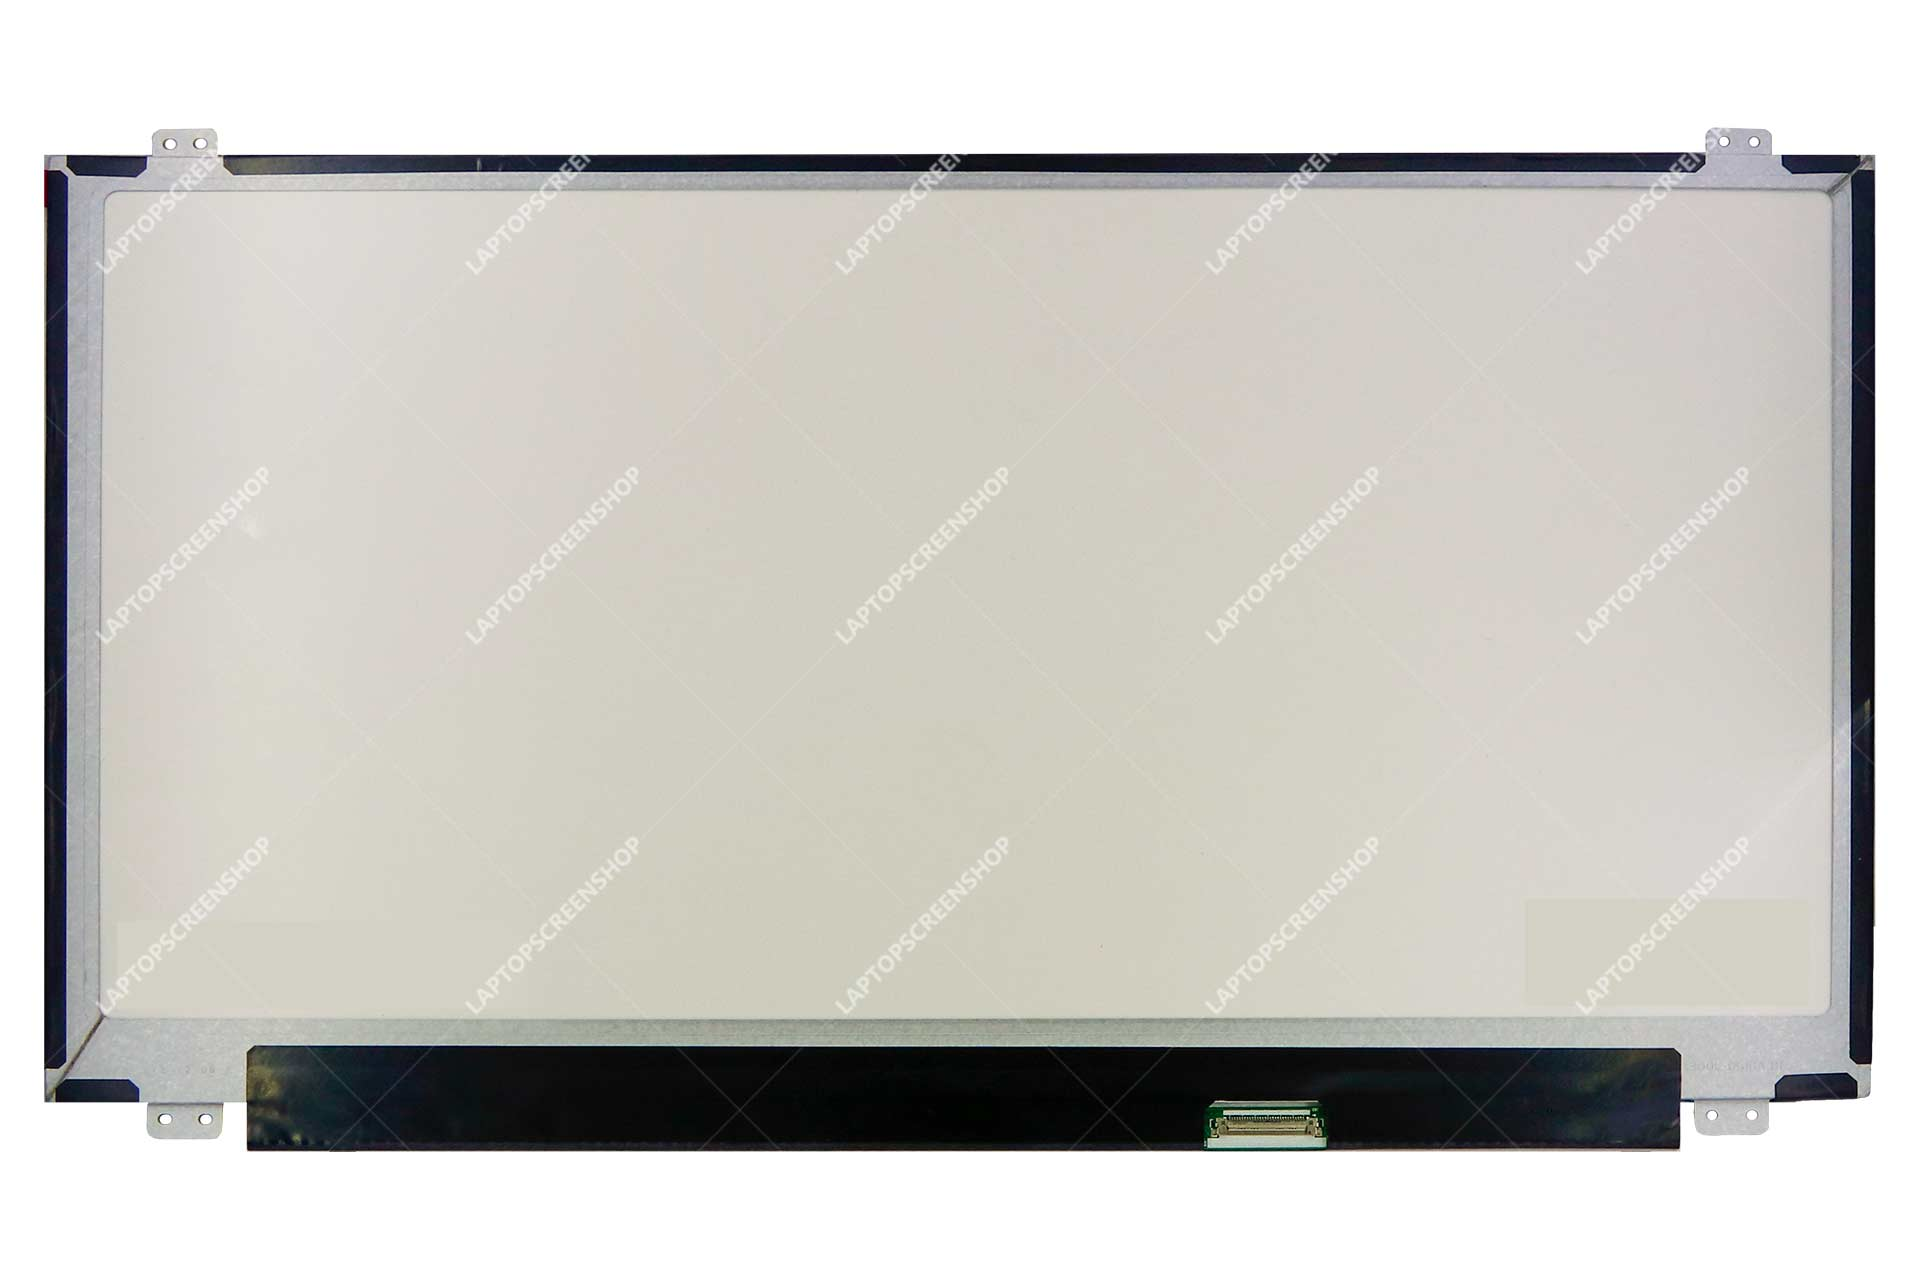 ACER-ASPIRE-E1-510-2821-LCD  HD فروشگاه لپ تاپ اسکرين   تعمير لپ تاپ